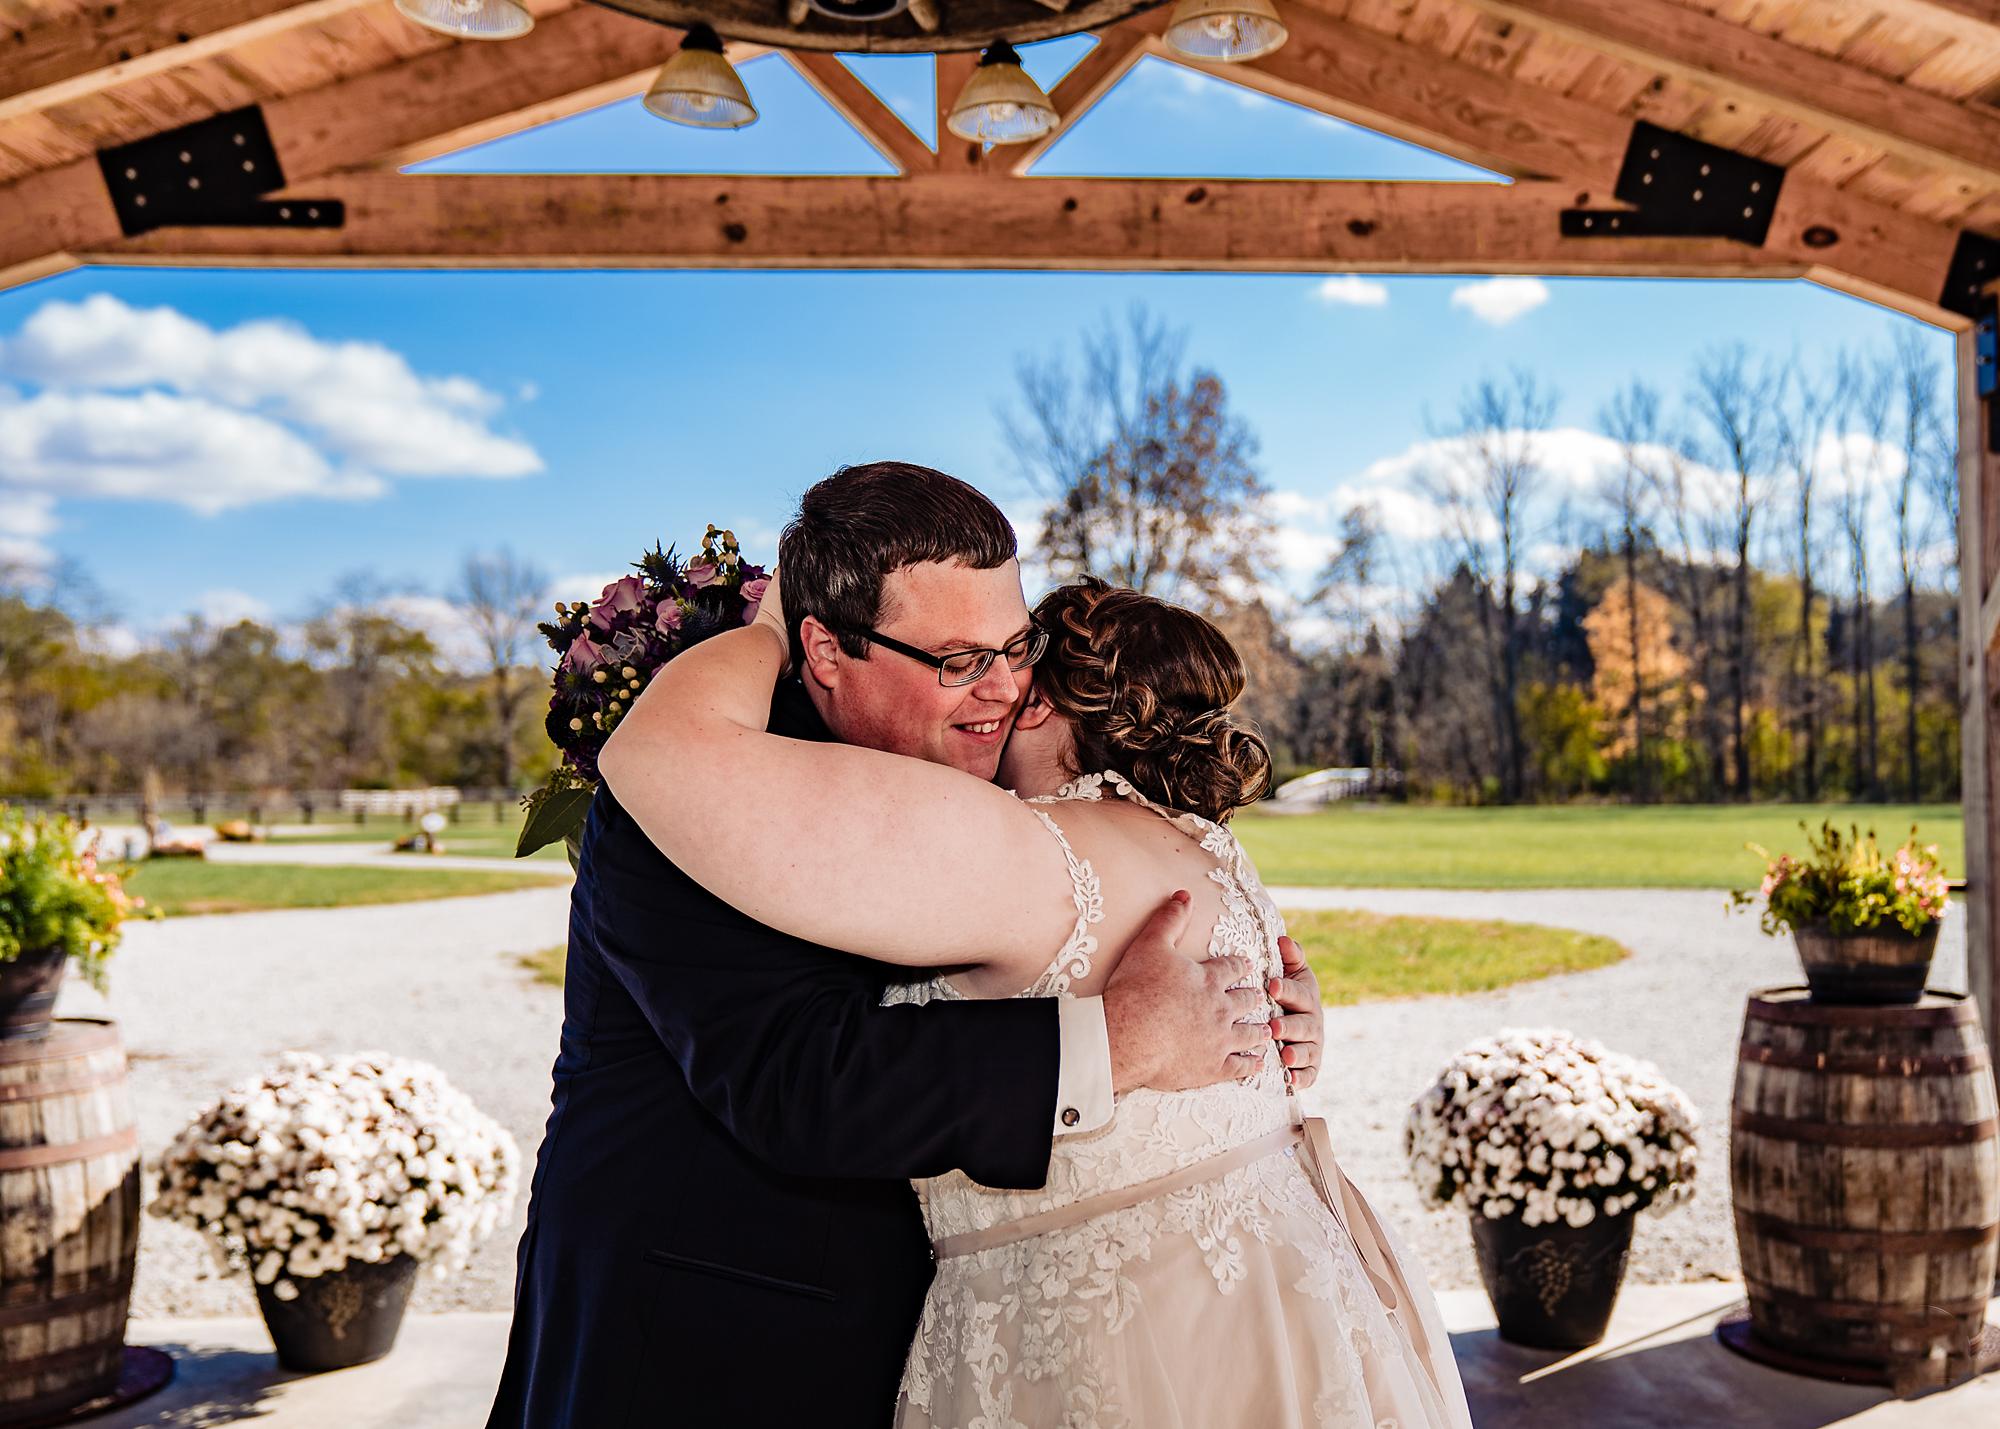 Silver-Creek-Stables-Wedding-Photography-8.jpg